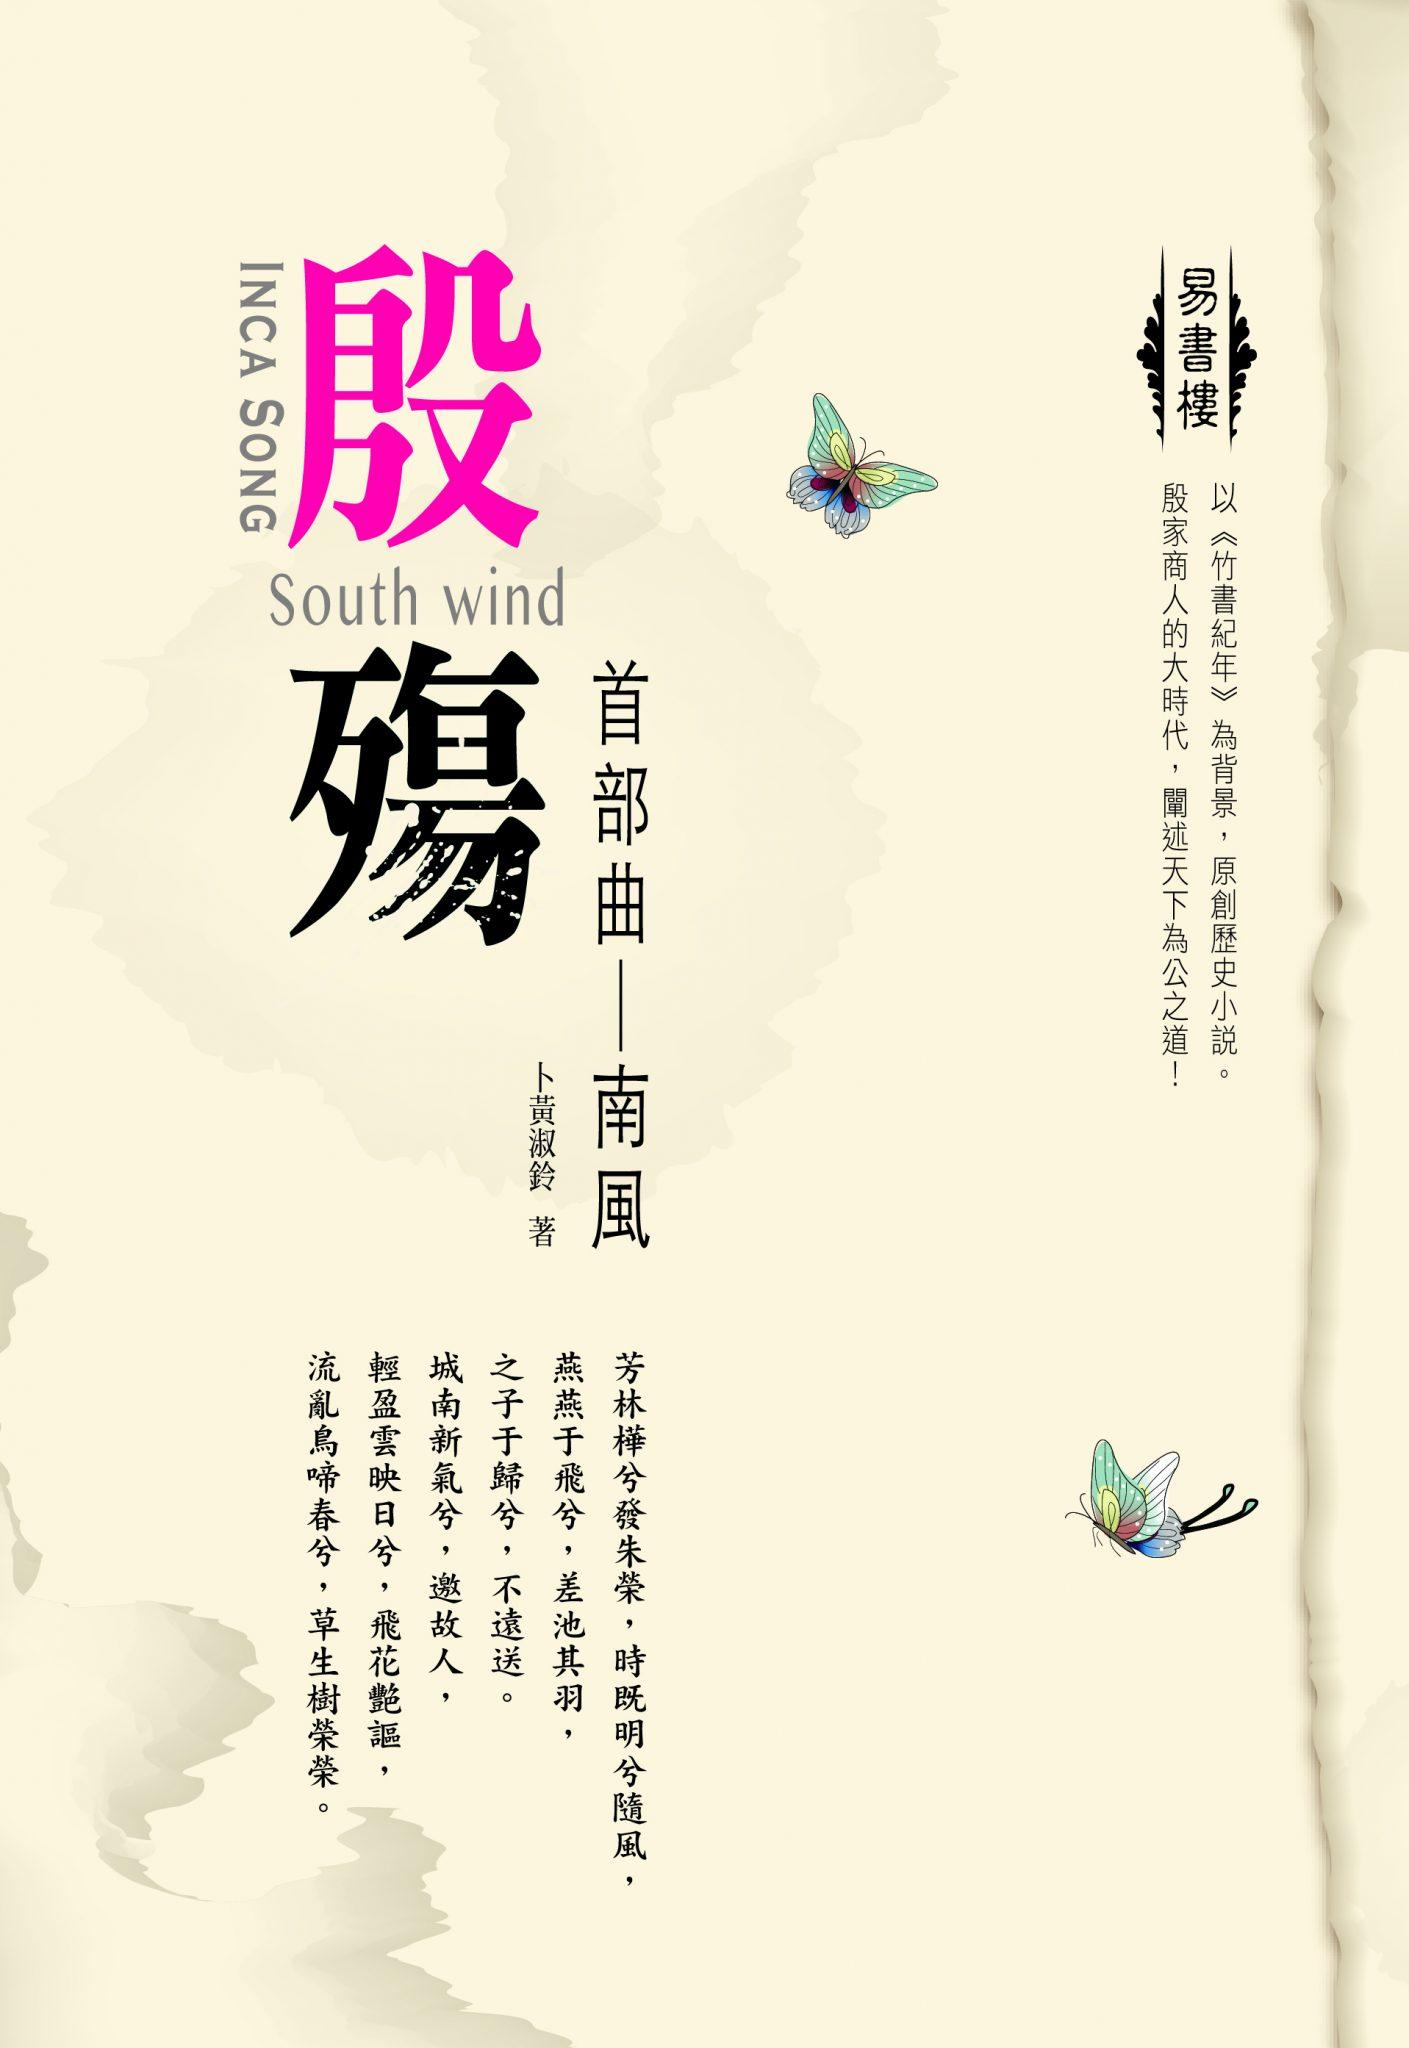 https://tw-book.com/wp-content/uploads/2015/06/南風封面.jpg